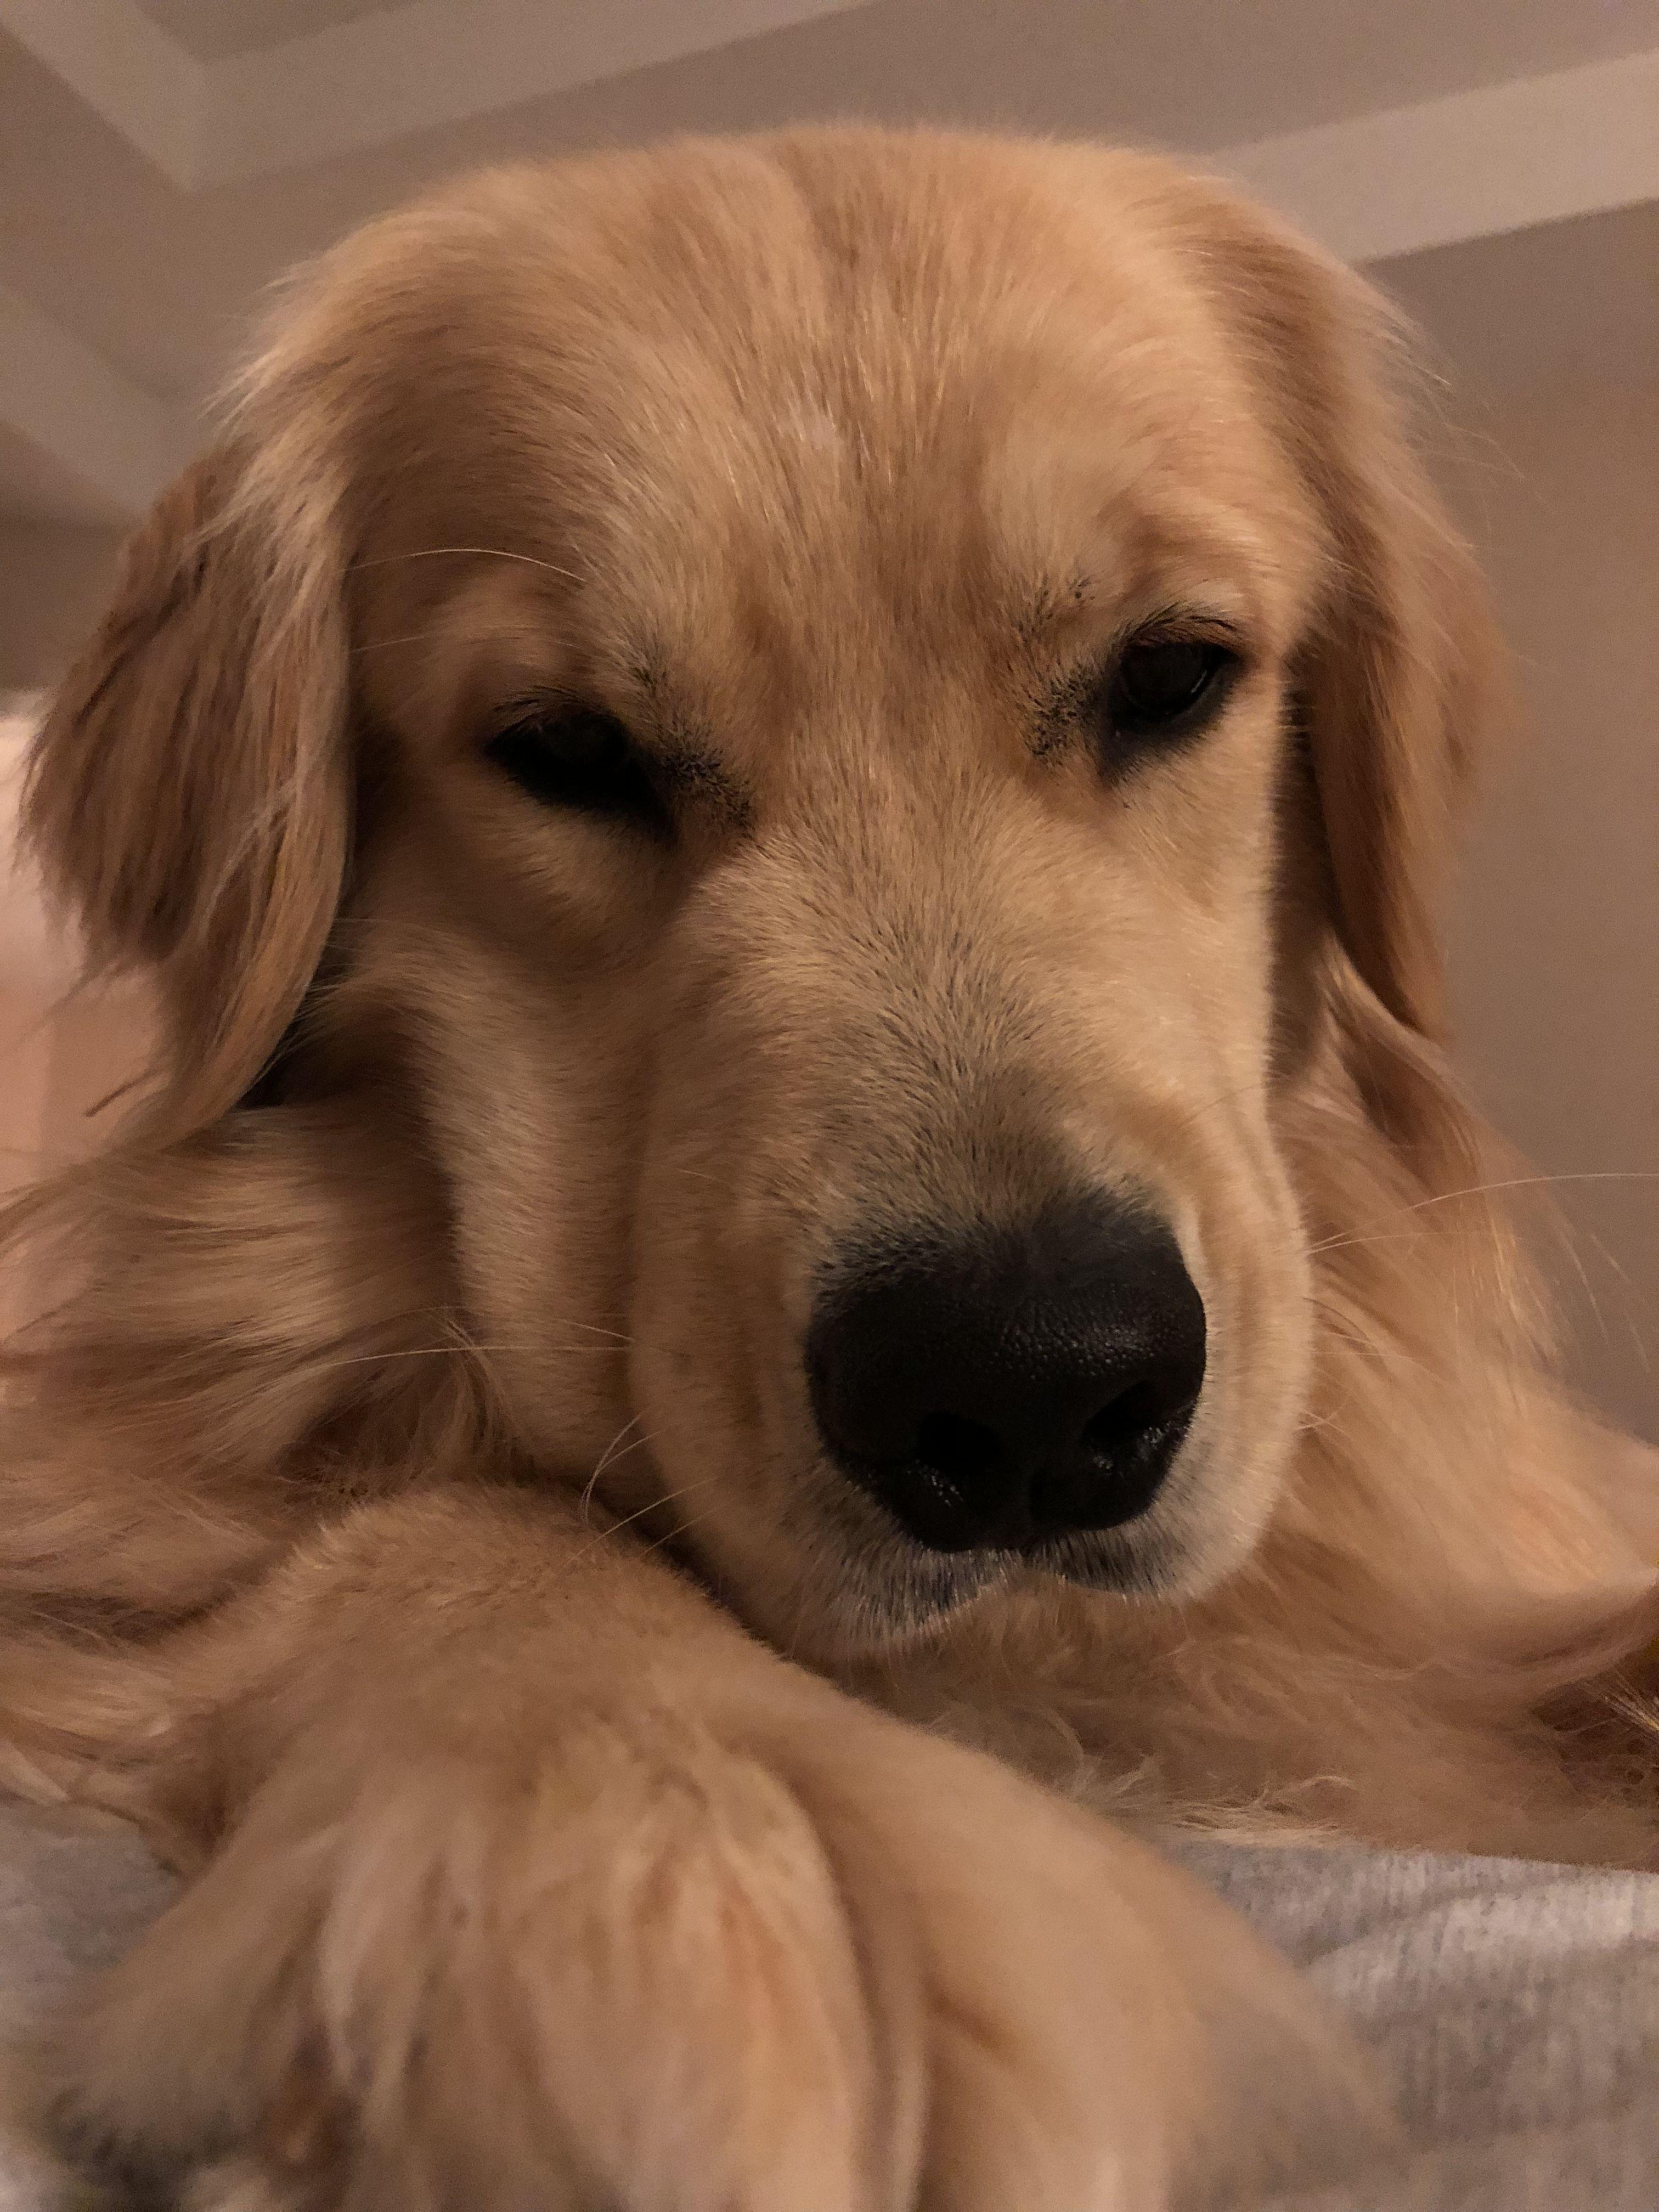 Cooper S Squishy Face Dog Love Golden Retriever Labrador Dogs